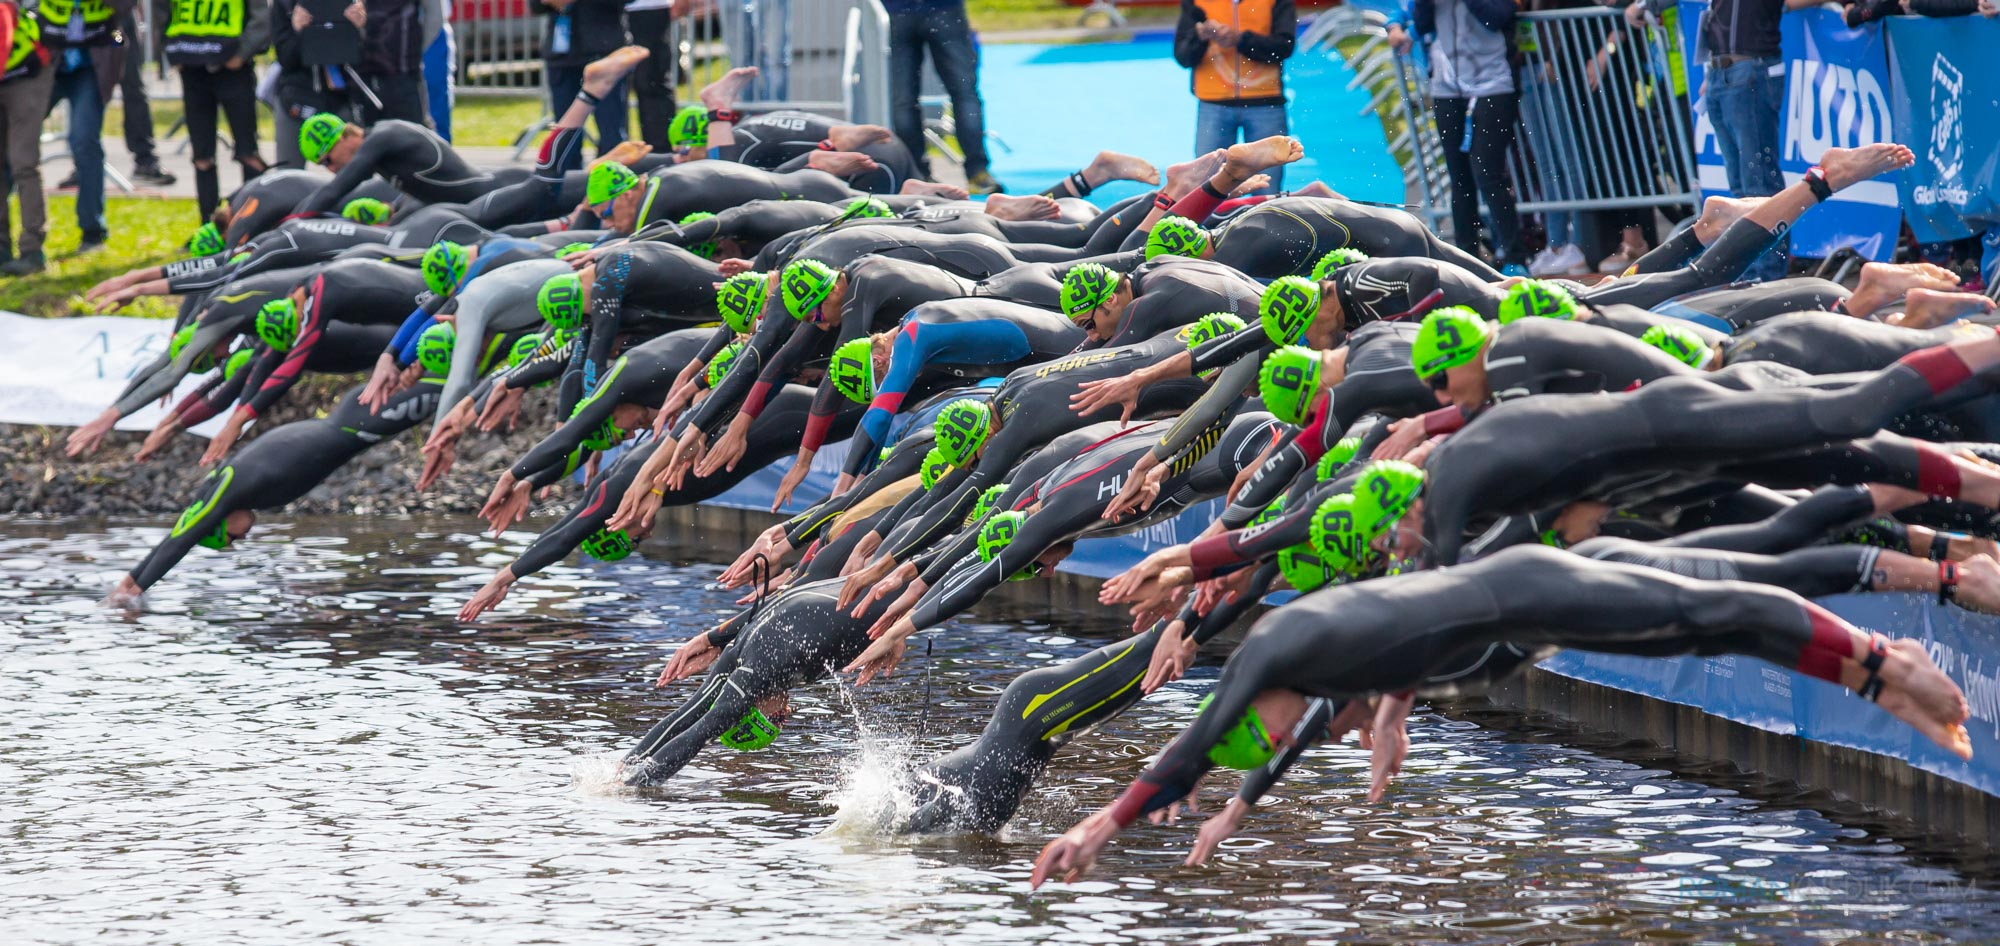 ICU_World_Cup_Triathlon_KV-2